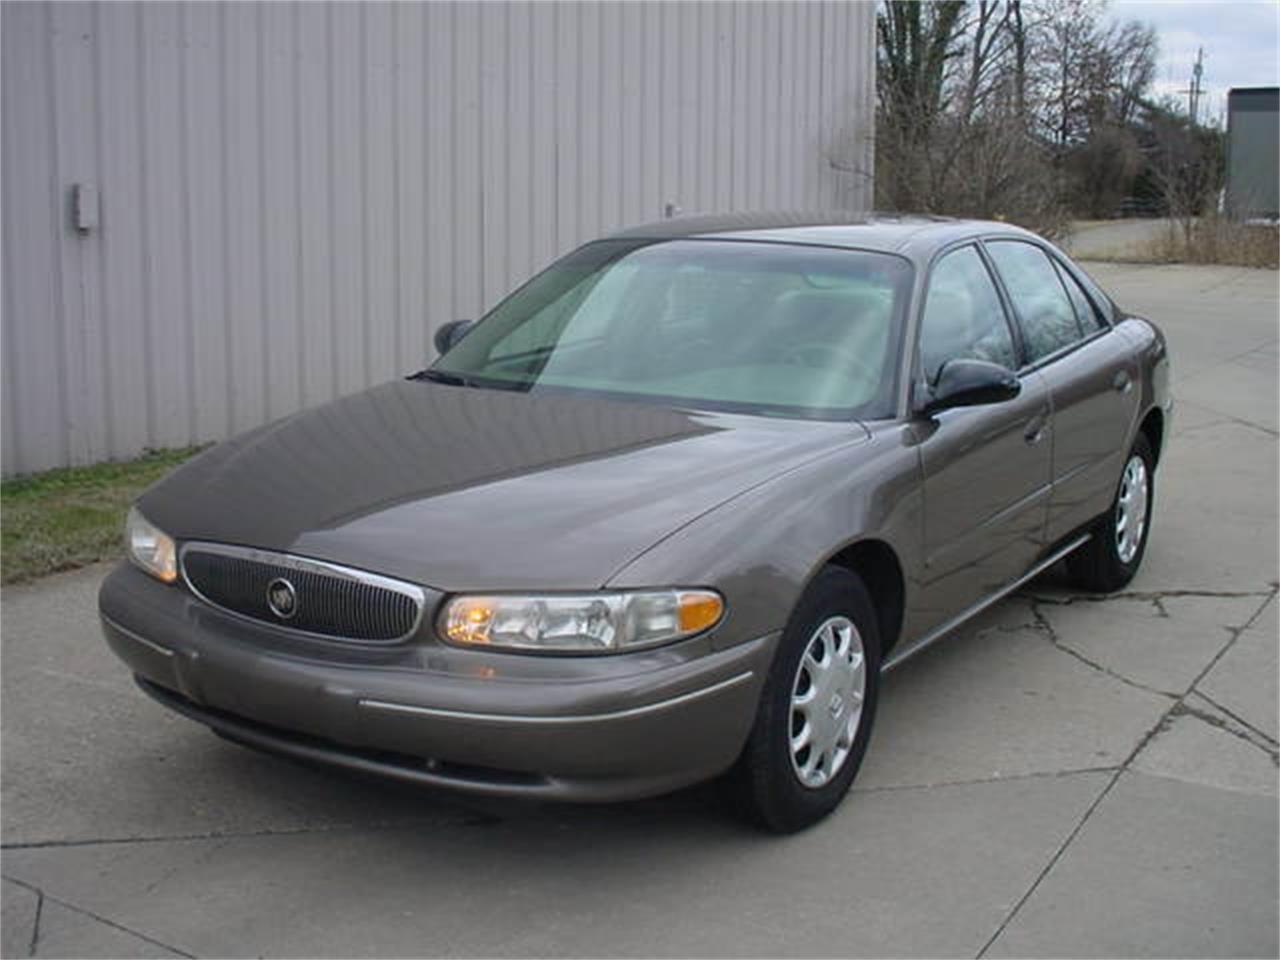 2003 Buick Century For Sale Classiccars Com Cc 1031127